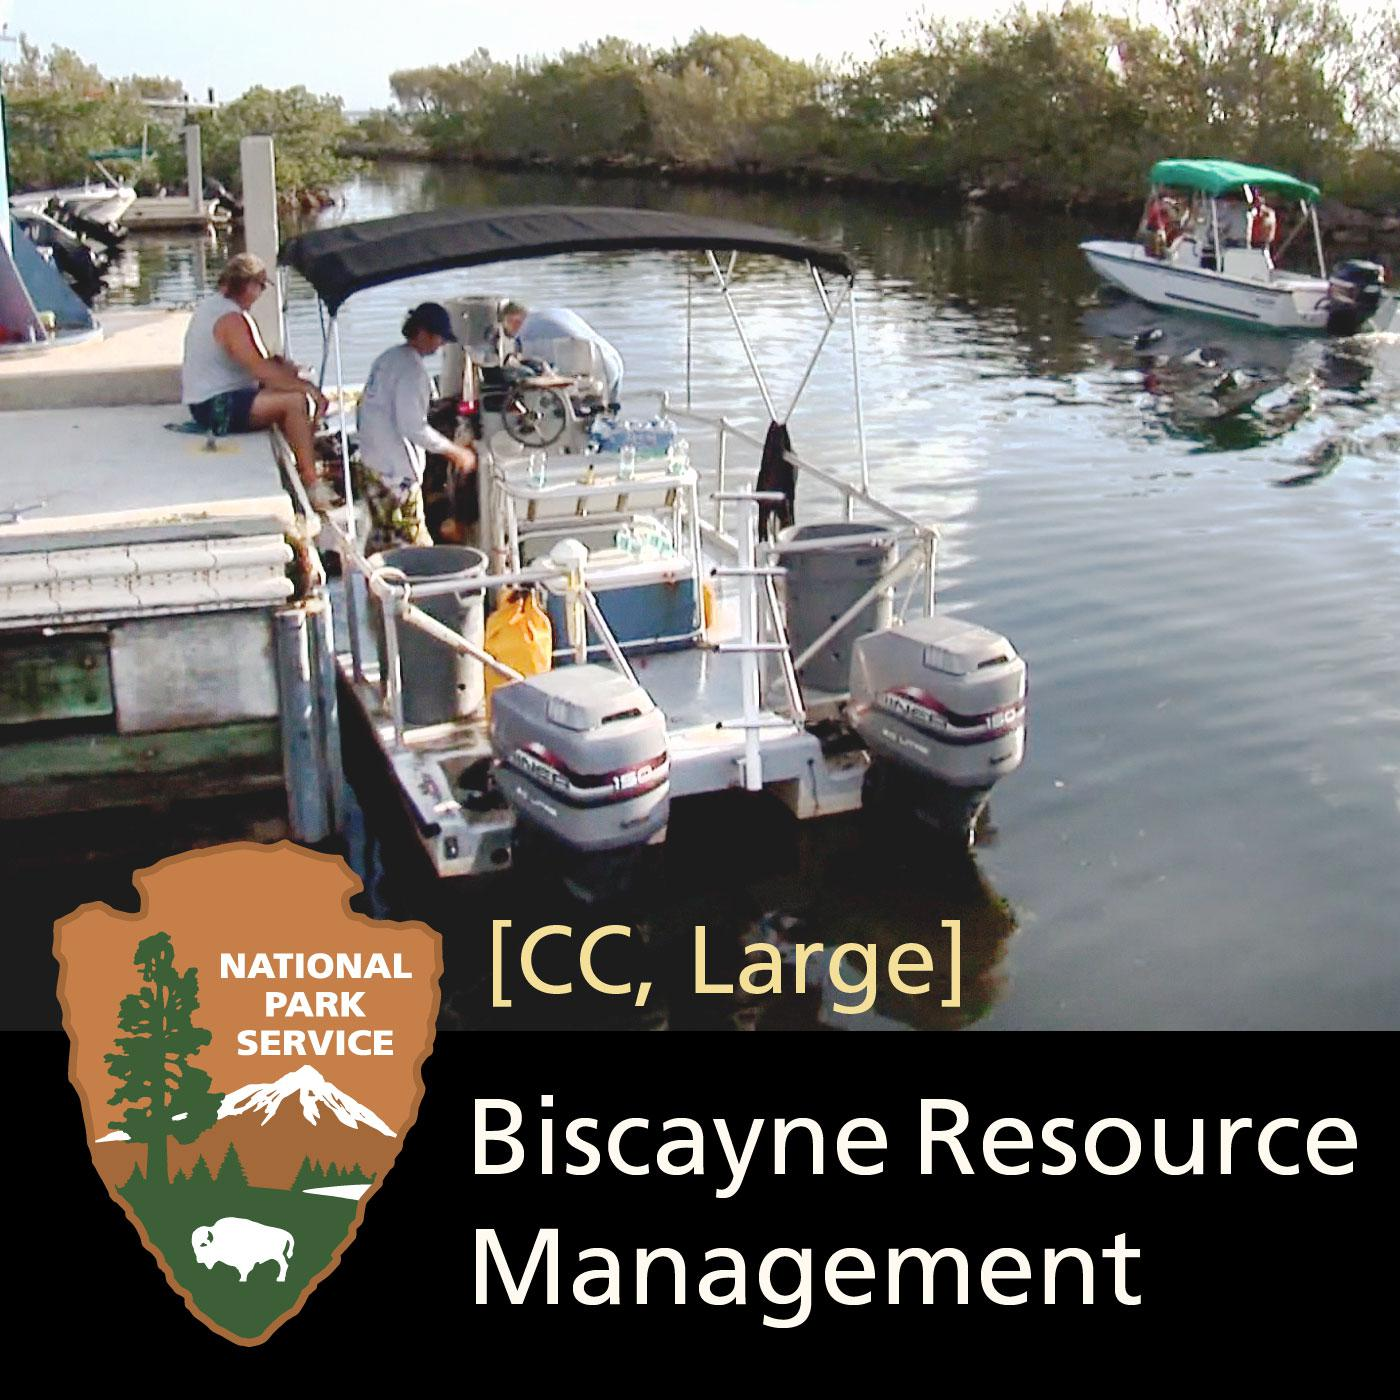 Resource Management at Biscayne National Park [CC, Large